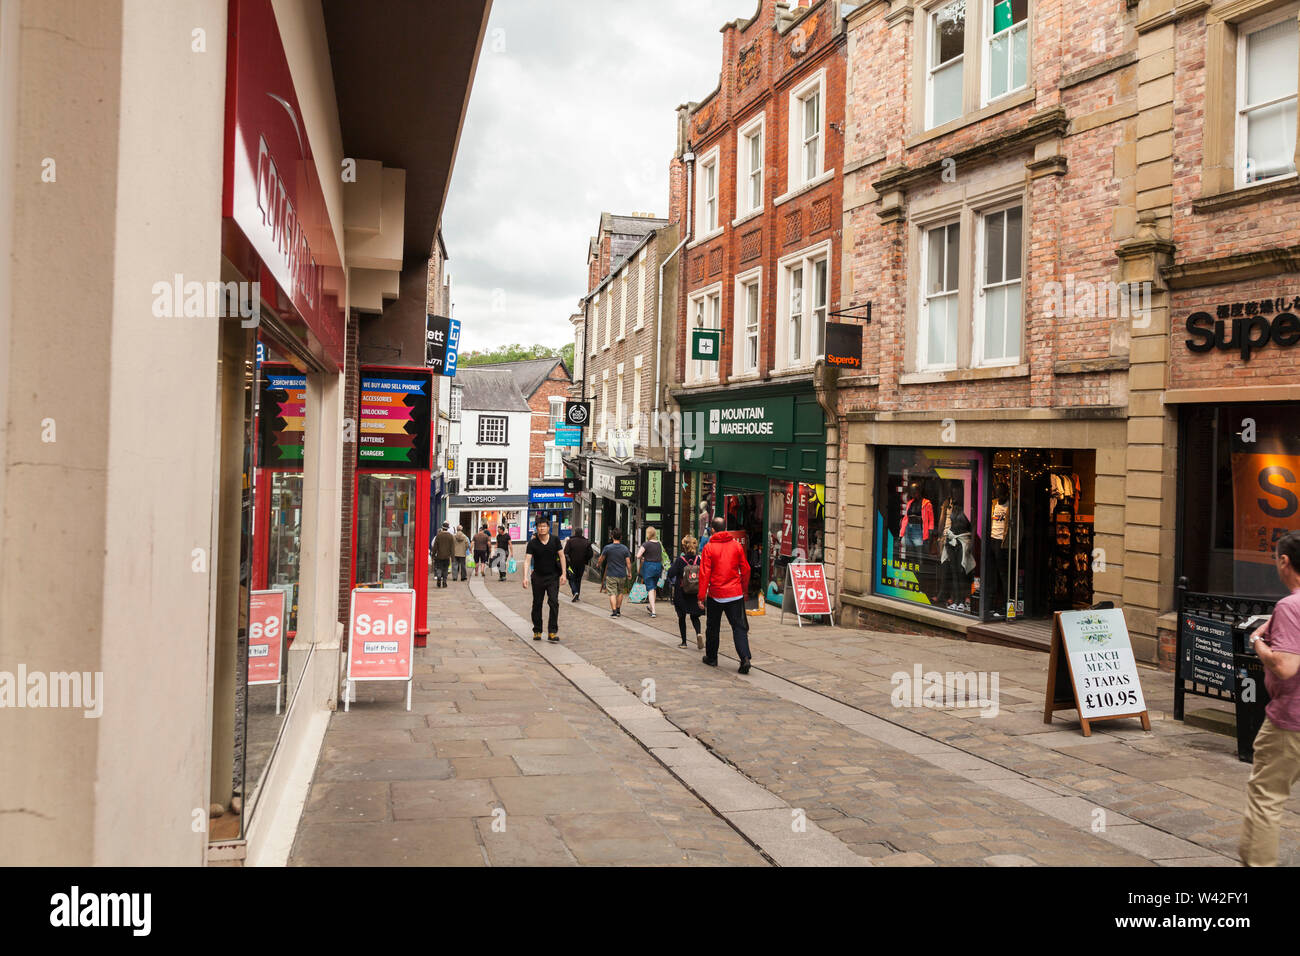 A street scene in Silver Street,Durham,England,UK - Stock Image